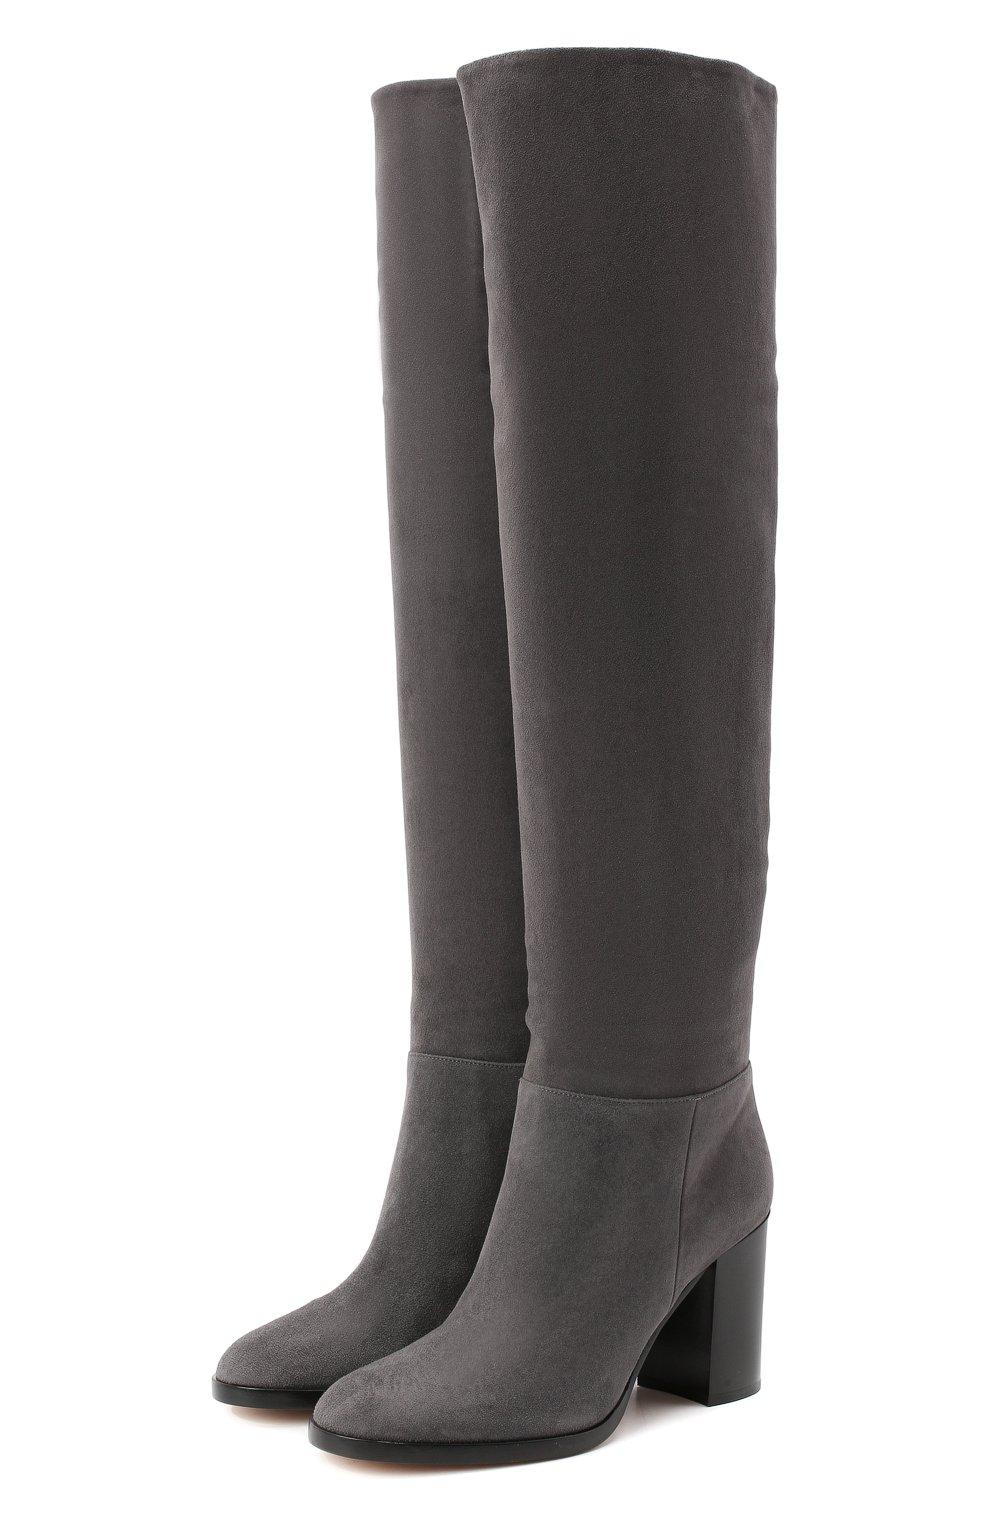 Женские замшевые сапоги daywear GIANVITO ROSSI серого цвета, арт. G80484.85CU0.C45LAPI | Фото 1